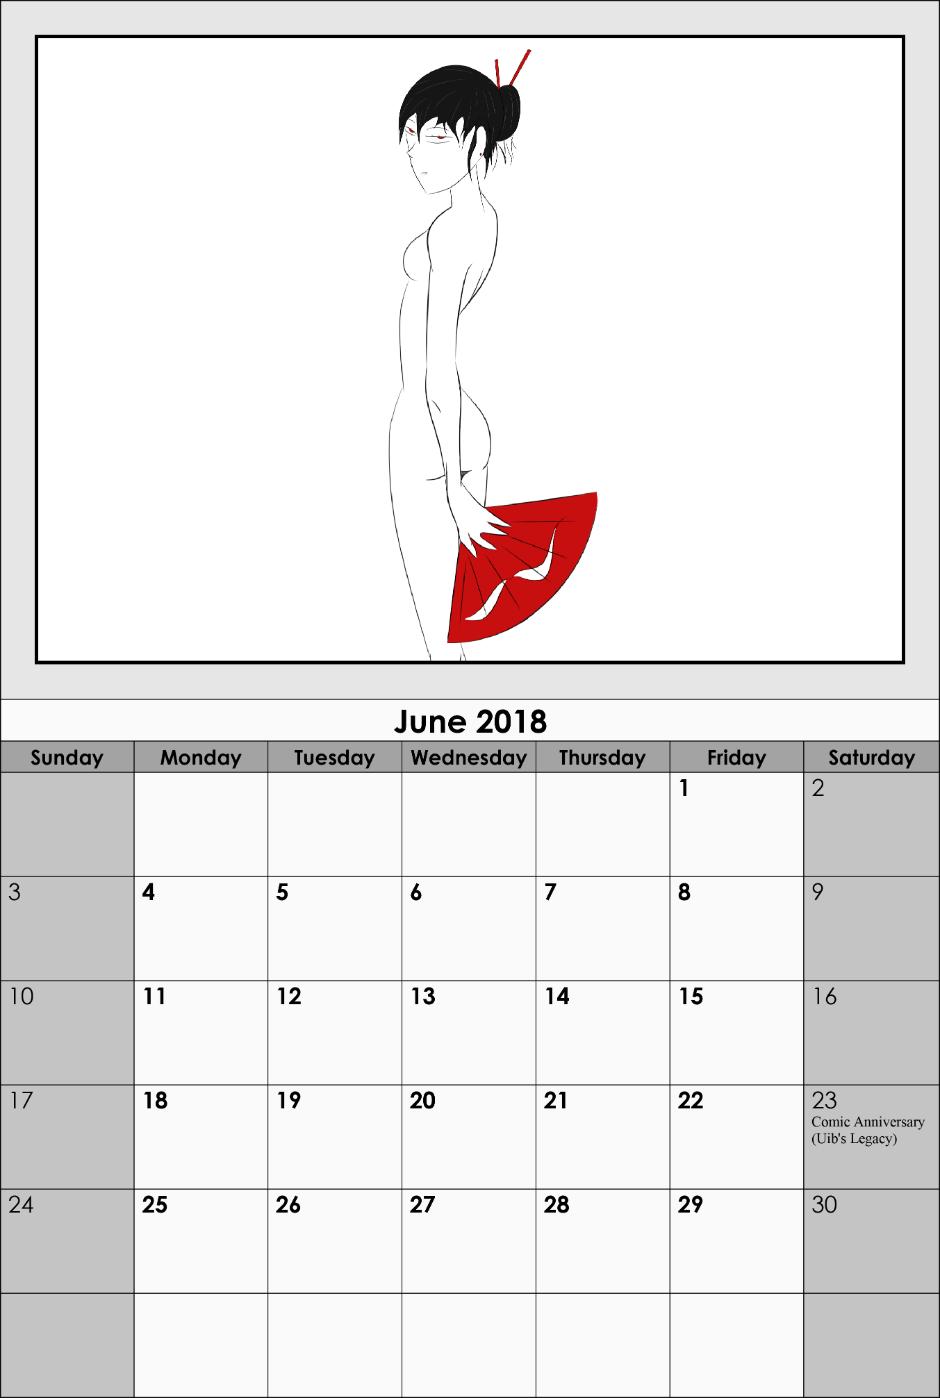 Rulerbrain - June